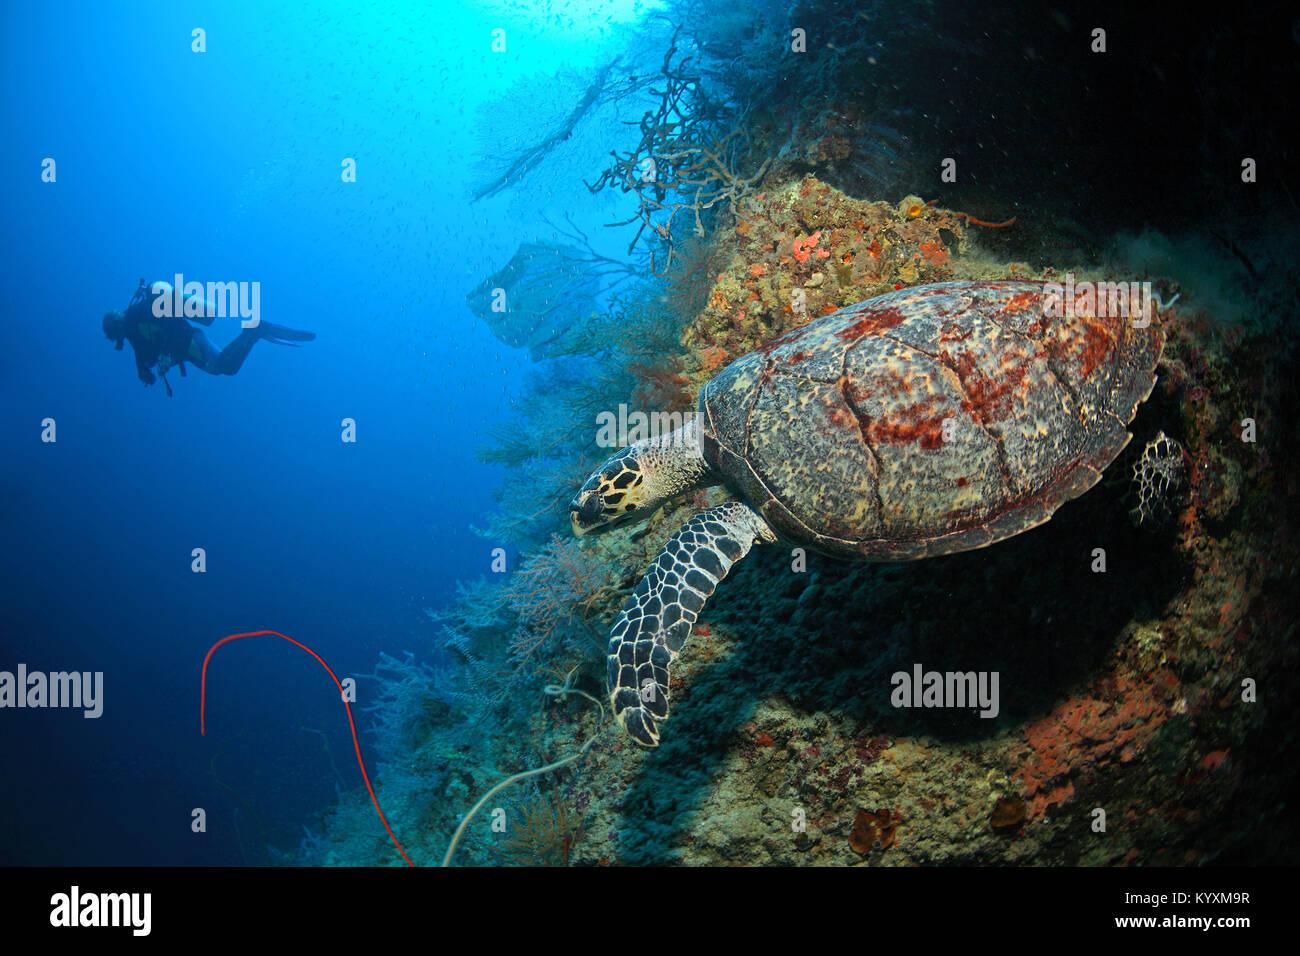 Scuba Diver e la tartaruga embricata (Eretmochelys imbricata), Moalboal, isola di Cebu, Filippine, Asia Immagini Stock